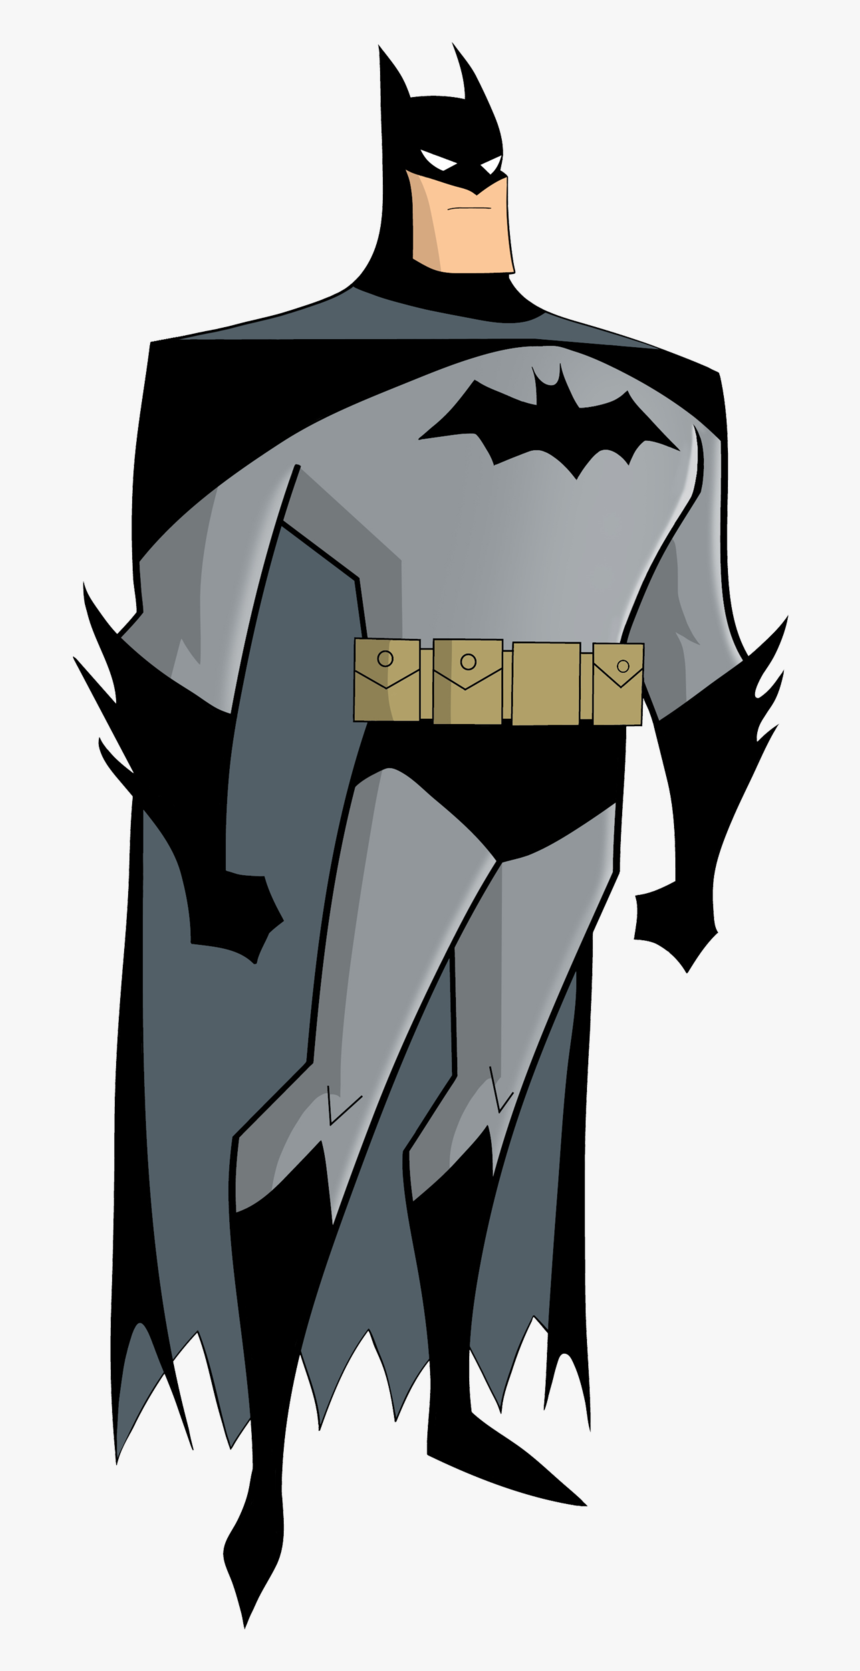 Vs Debating Wiki - Batman Animated Series Png, Transparent Png, Free Download